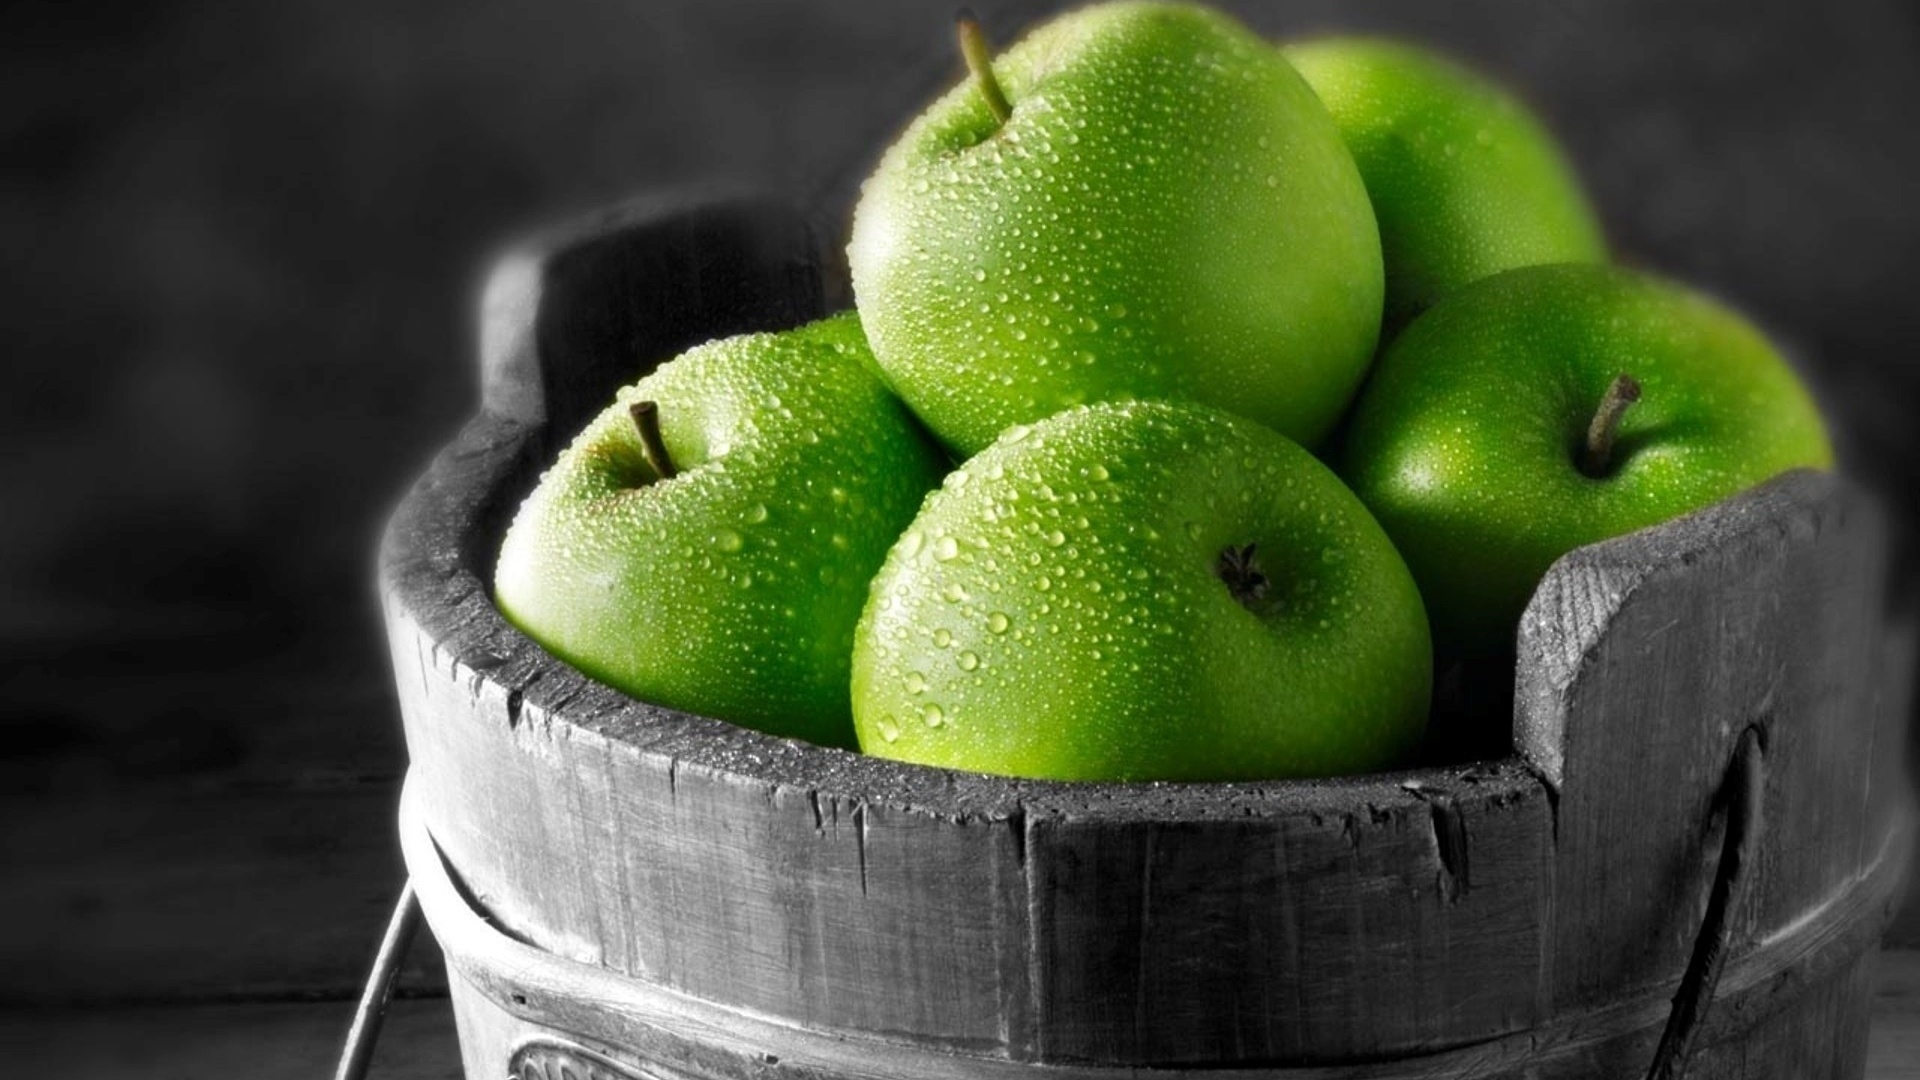 Green Apple Fruit Wallpapers   1920x1080   440525 1920x1080